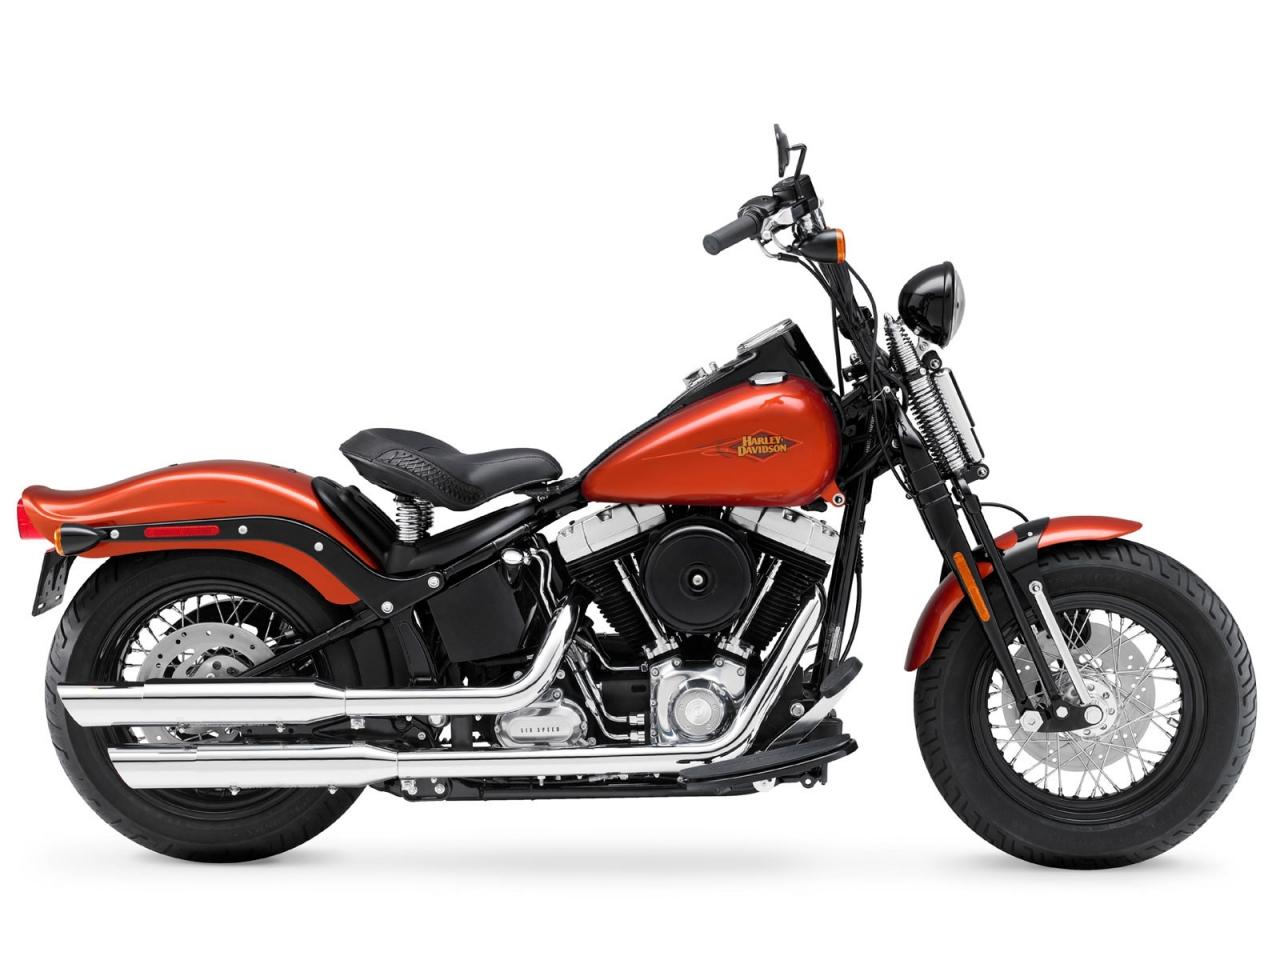 Harley Davidson Clip Art ..-Harley Davidson Clip Art ..-7